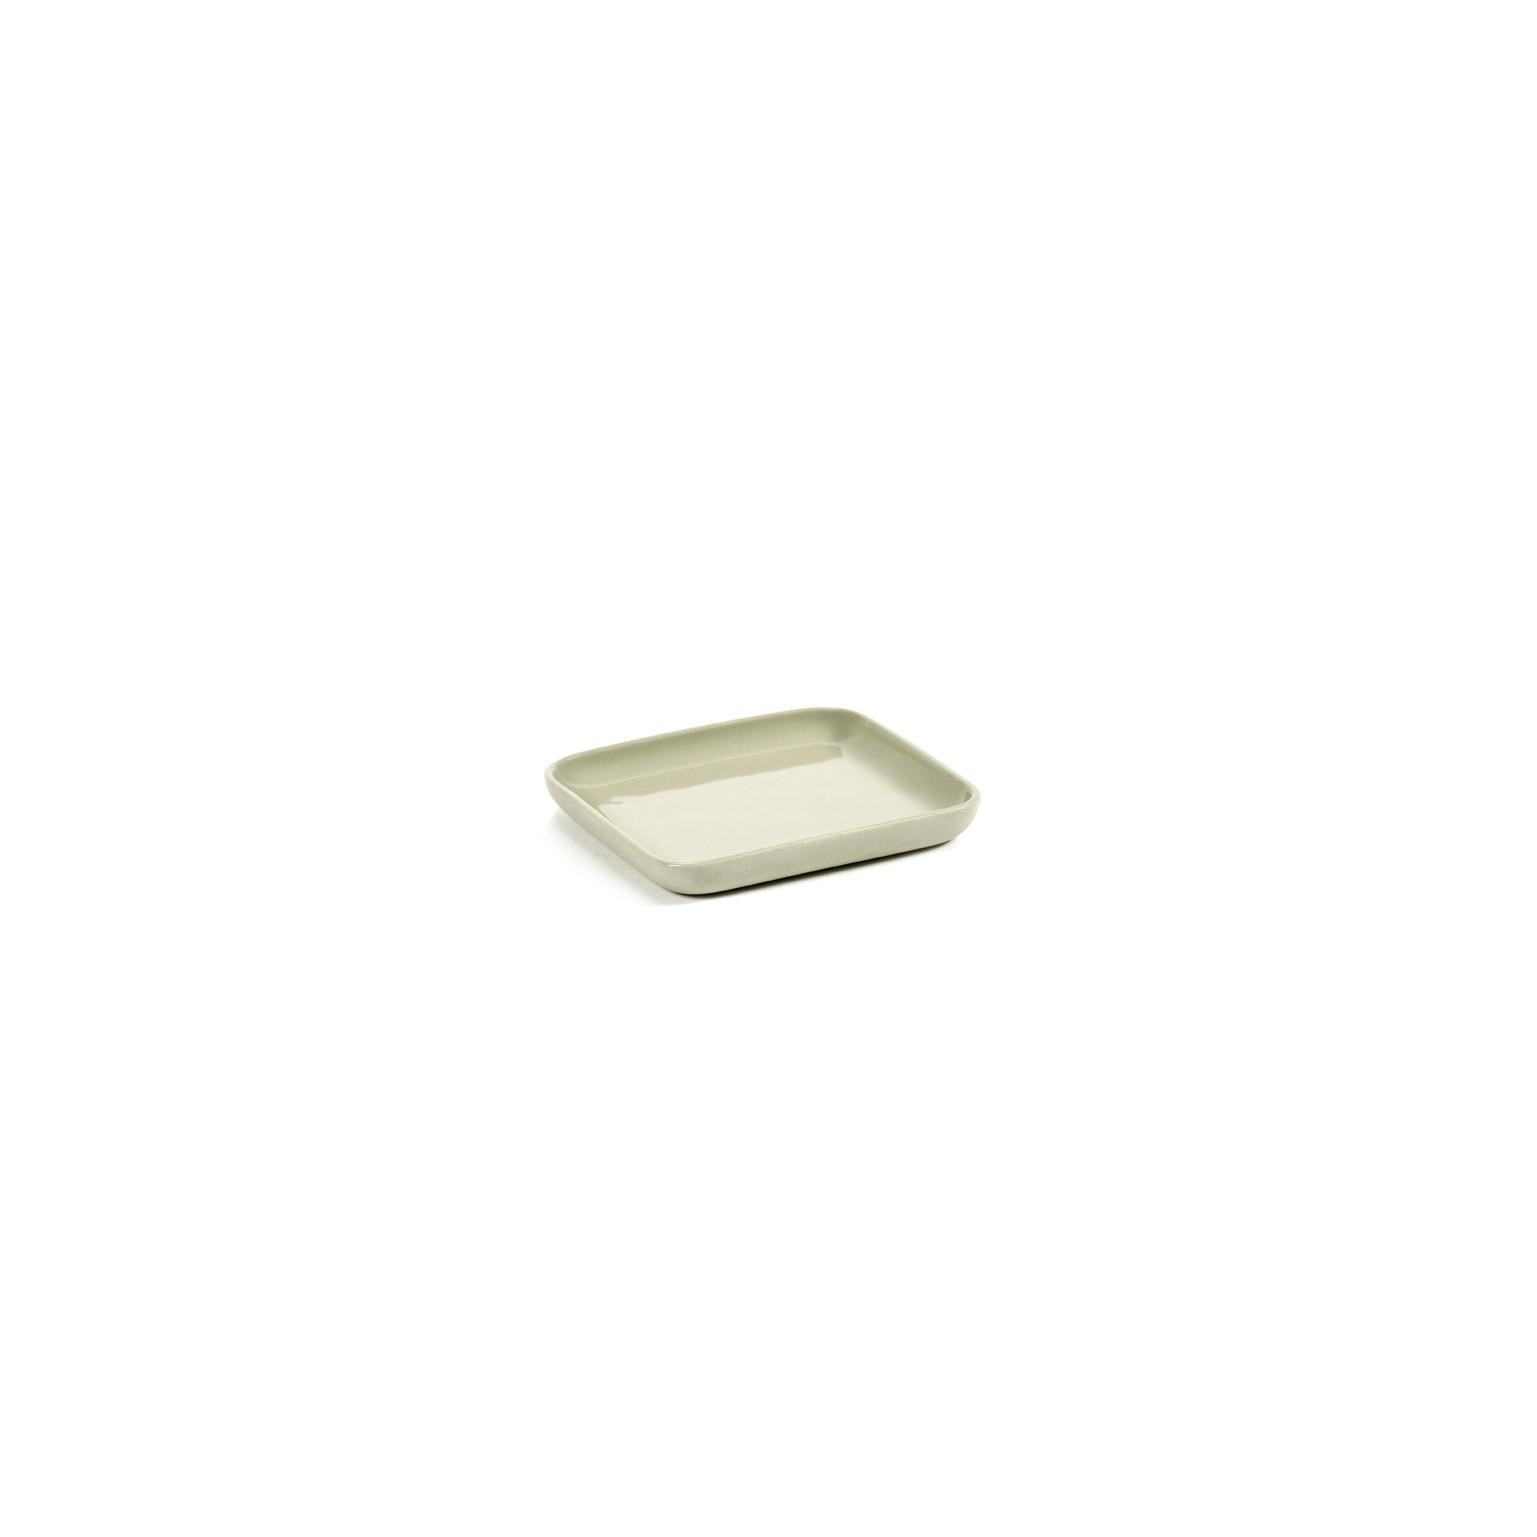 Quadratisches Tablett Cose   Beige